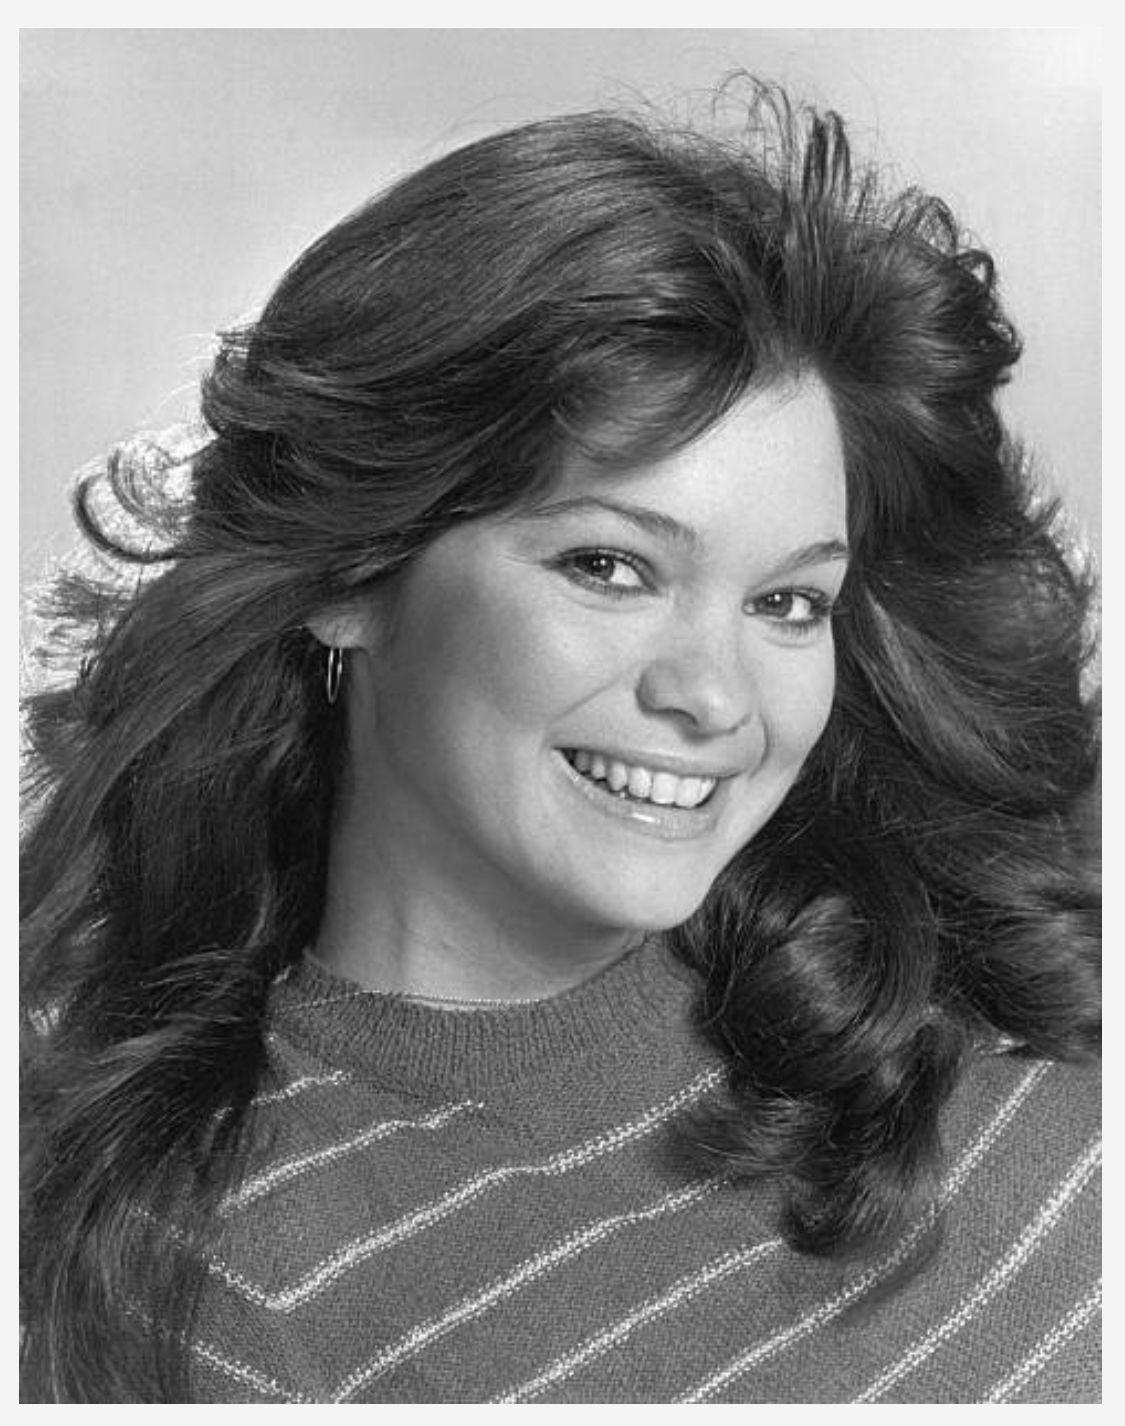 Valerie Bertinelli Valerie Bertinelli Beautiful Actresses Hair Styles